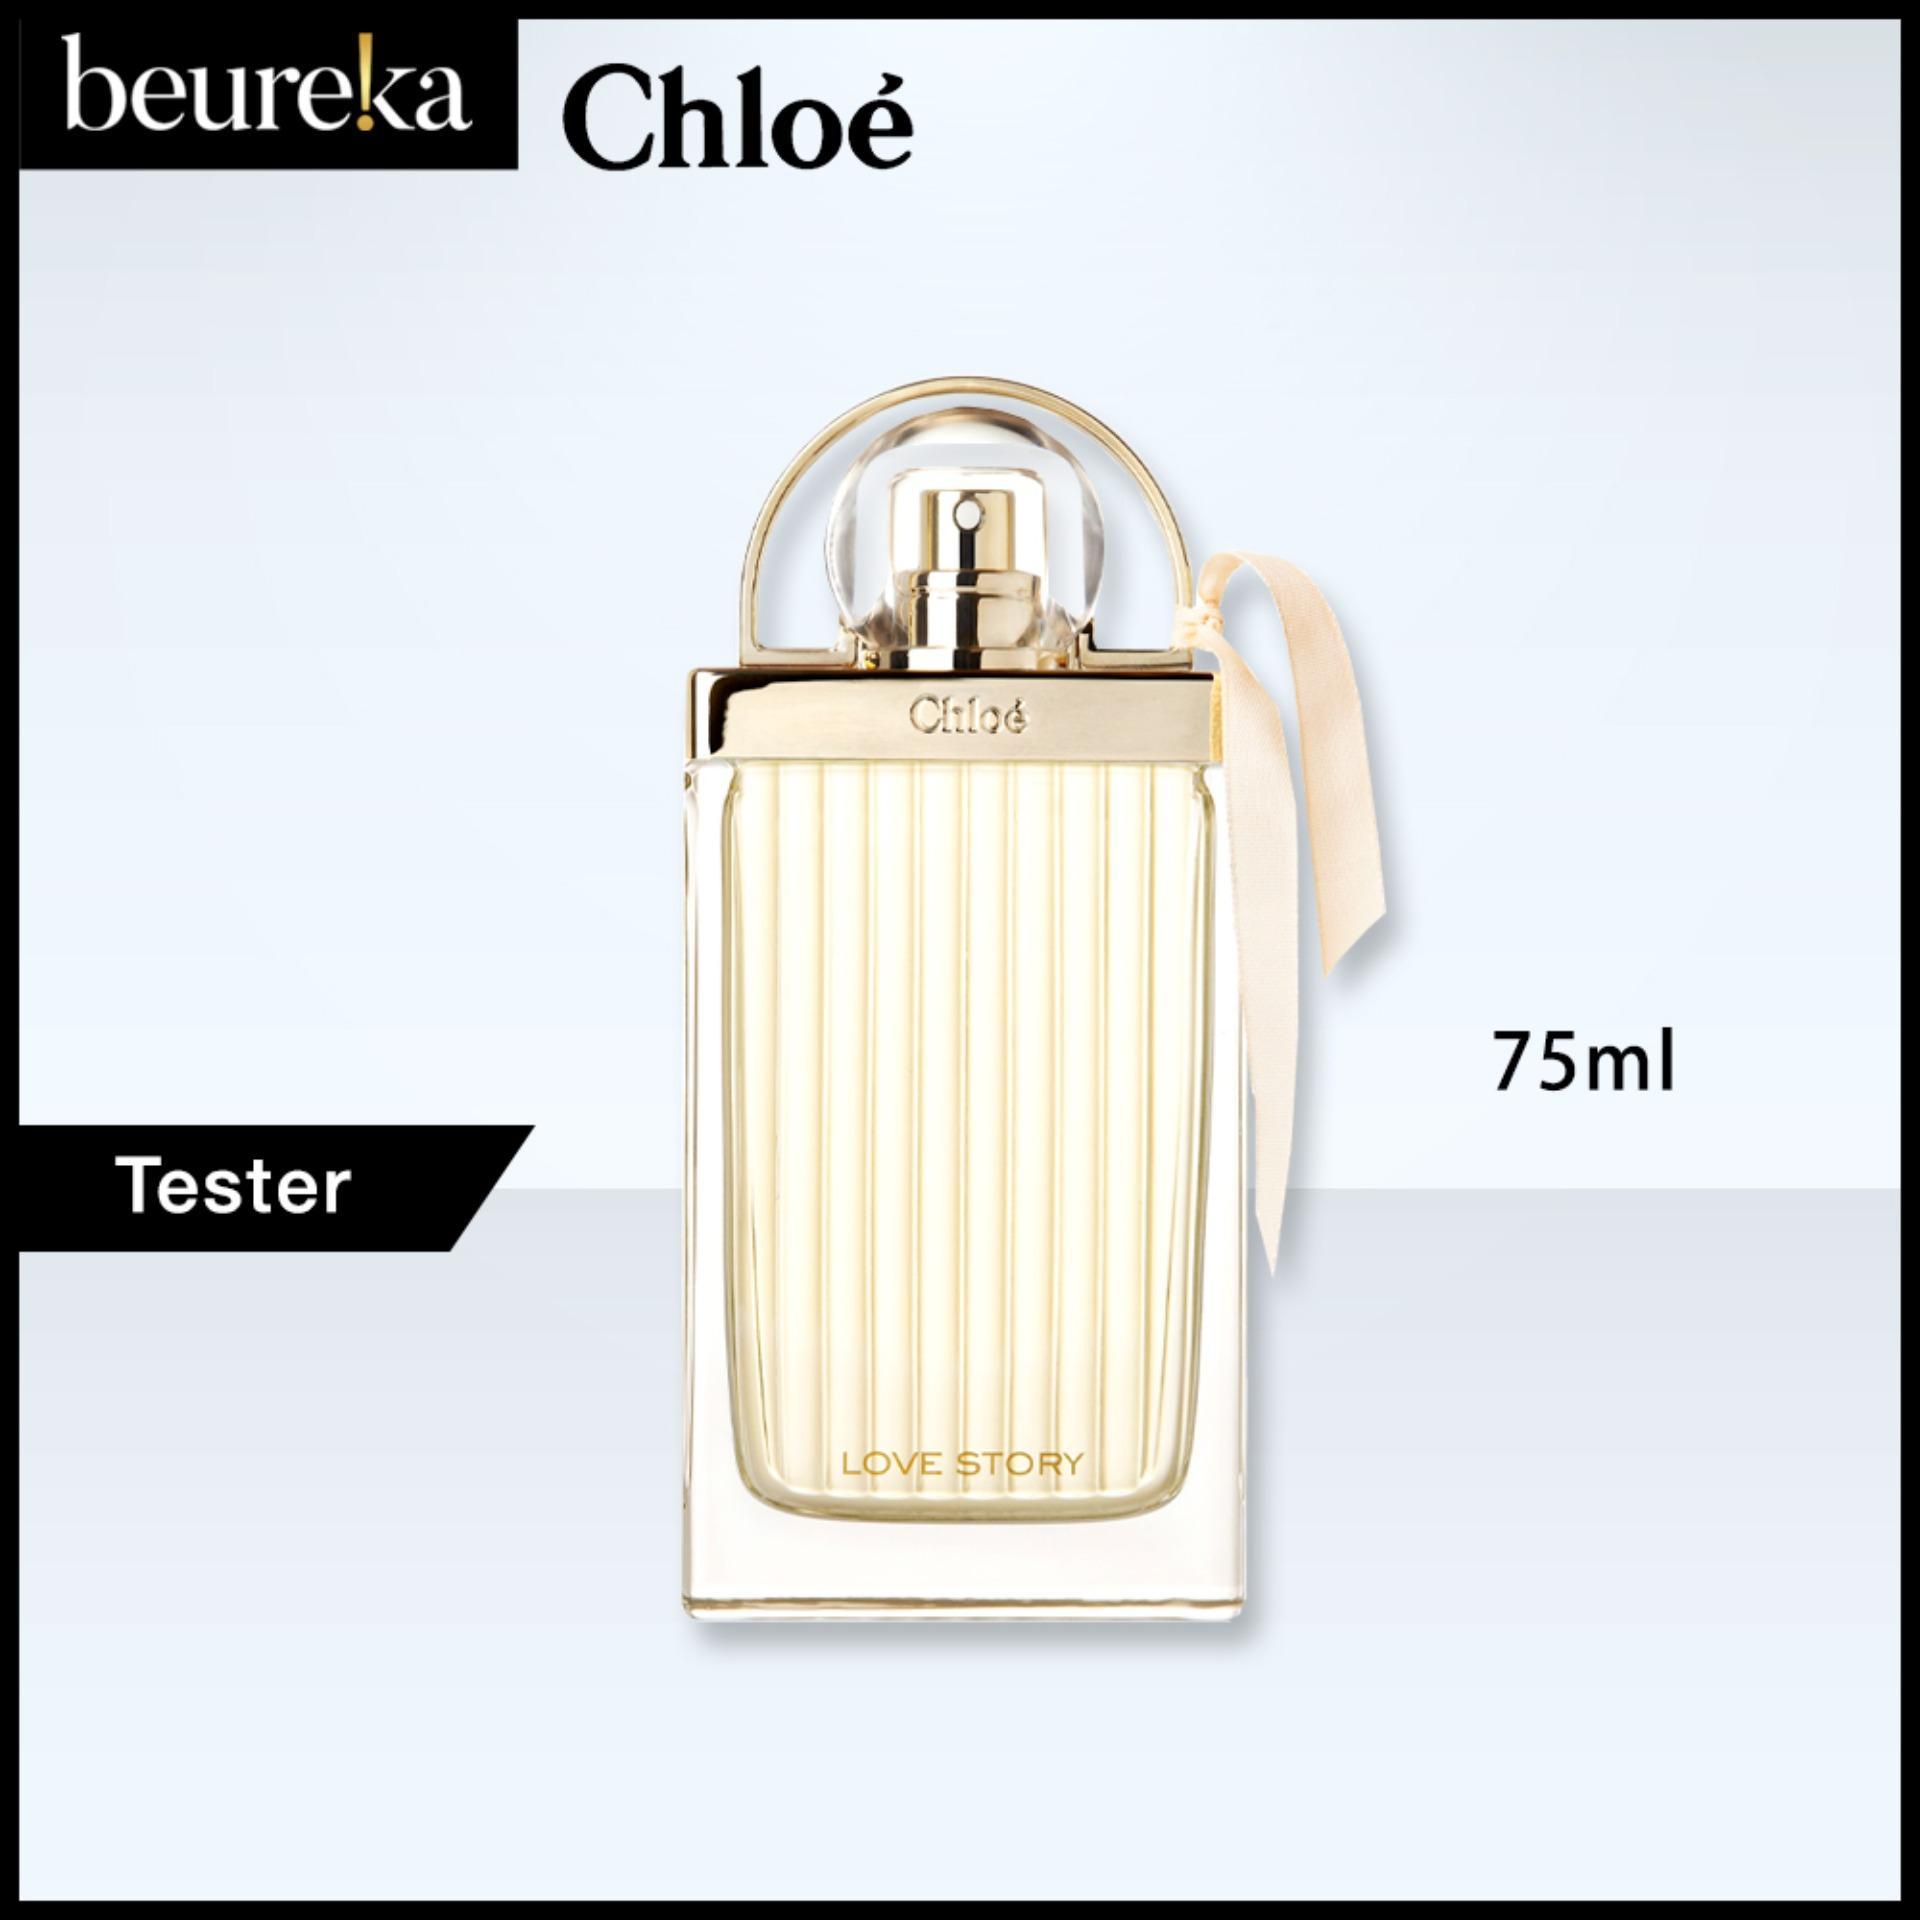 Buy Chloe Love Story EDP 75ml Tester - Beureka [Luxury Beauty (Perfume) - Fragrances for Women / Ladies Eau de Parfum Brand New 100% Authentic] Singapore